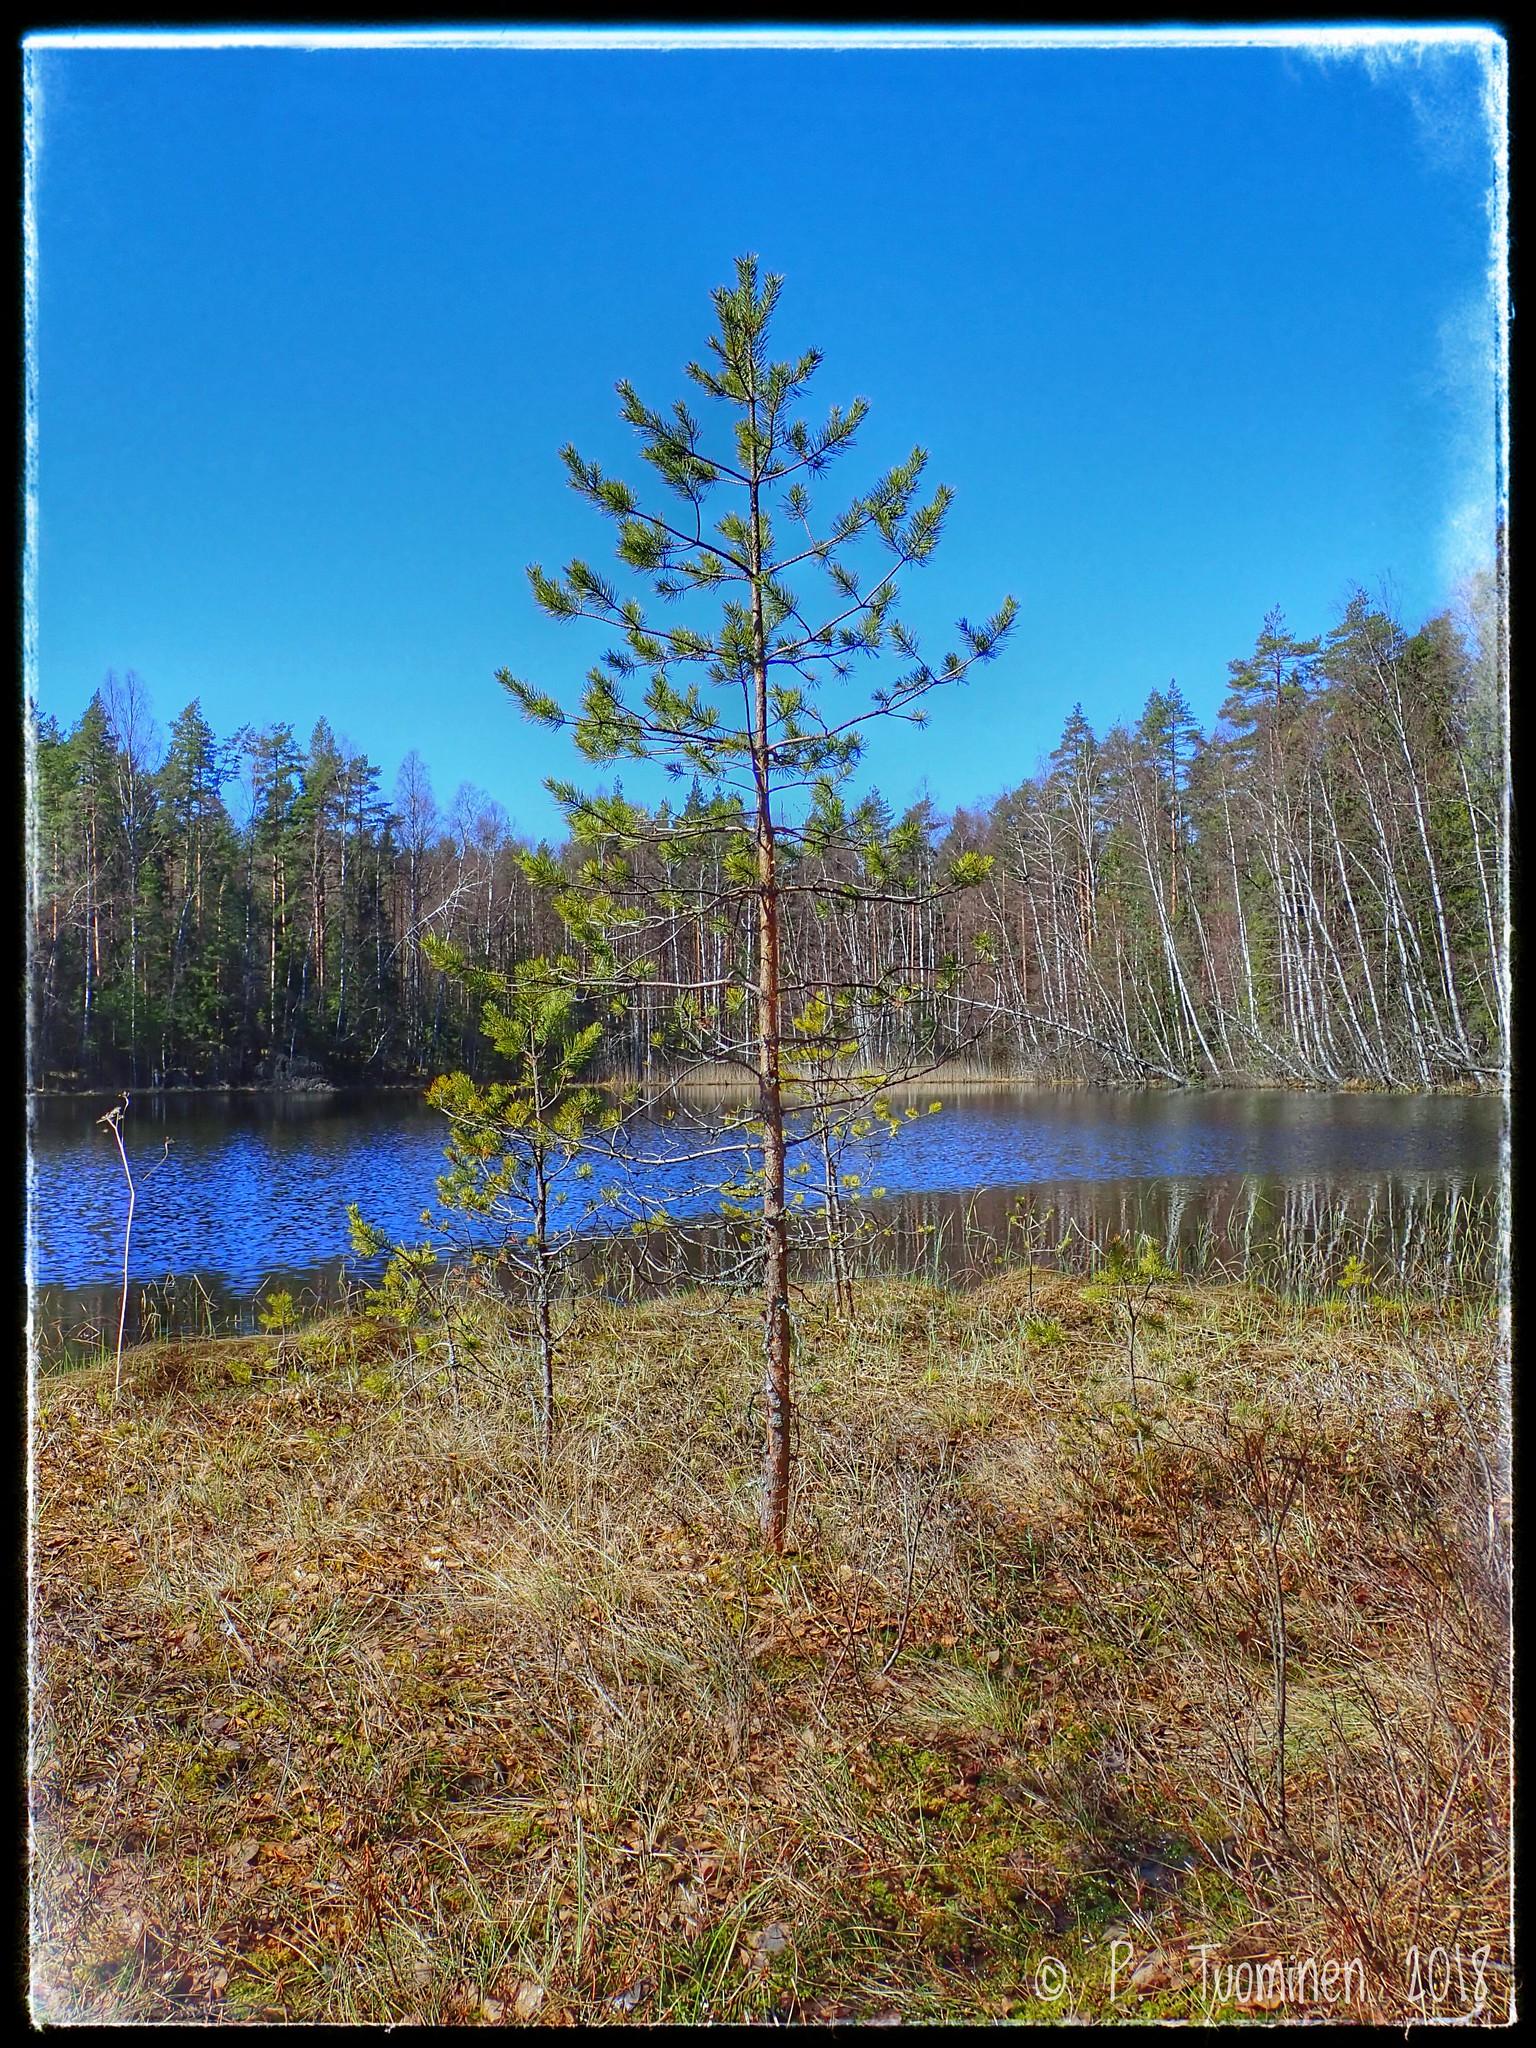 Pine on shore